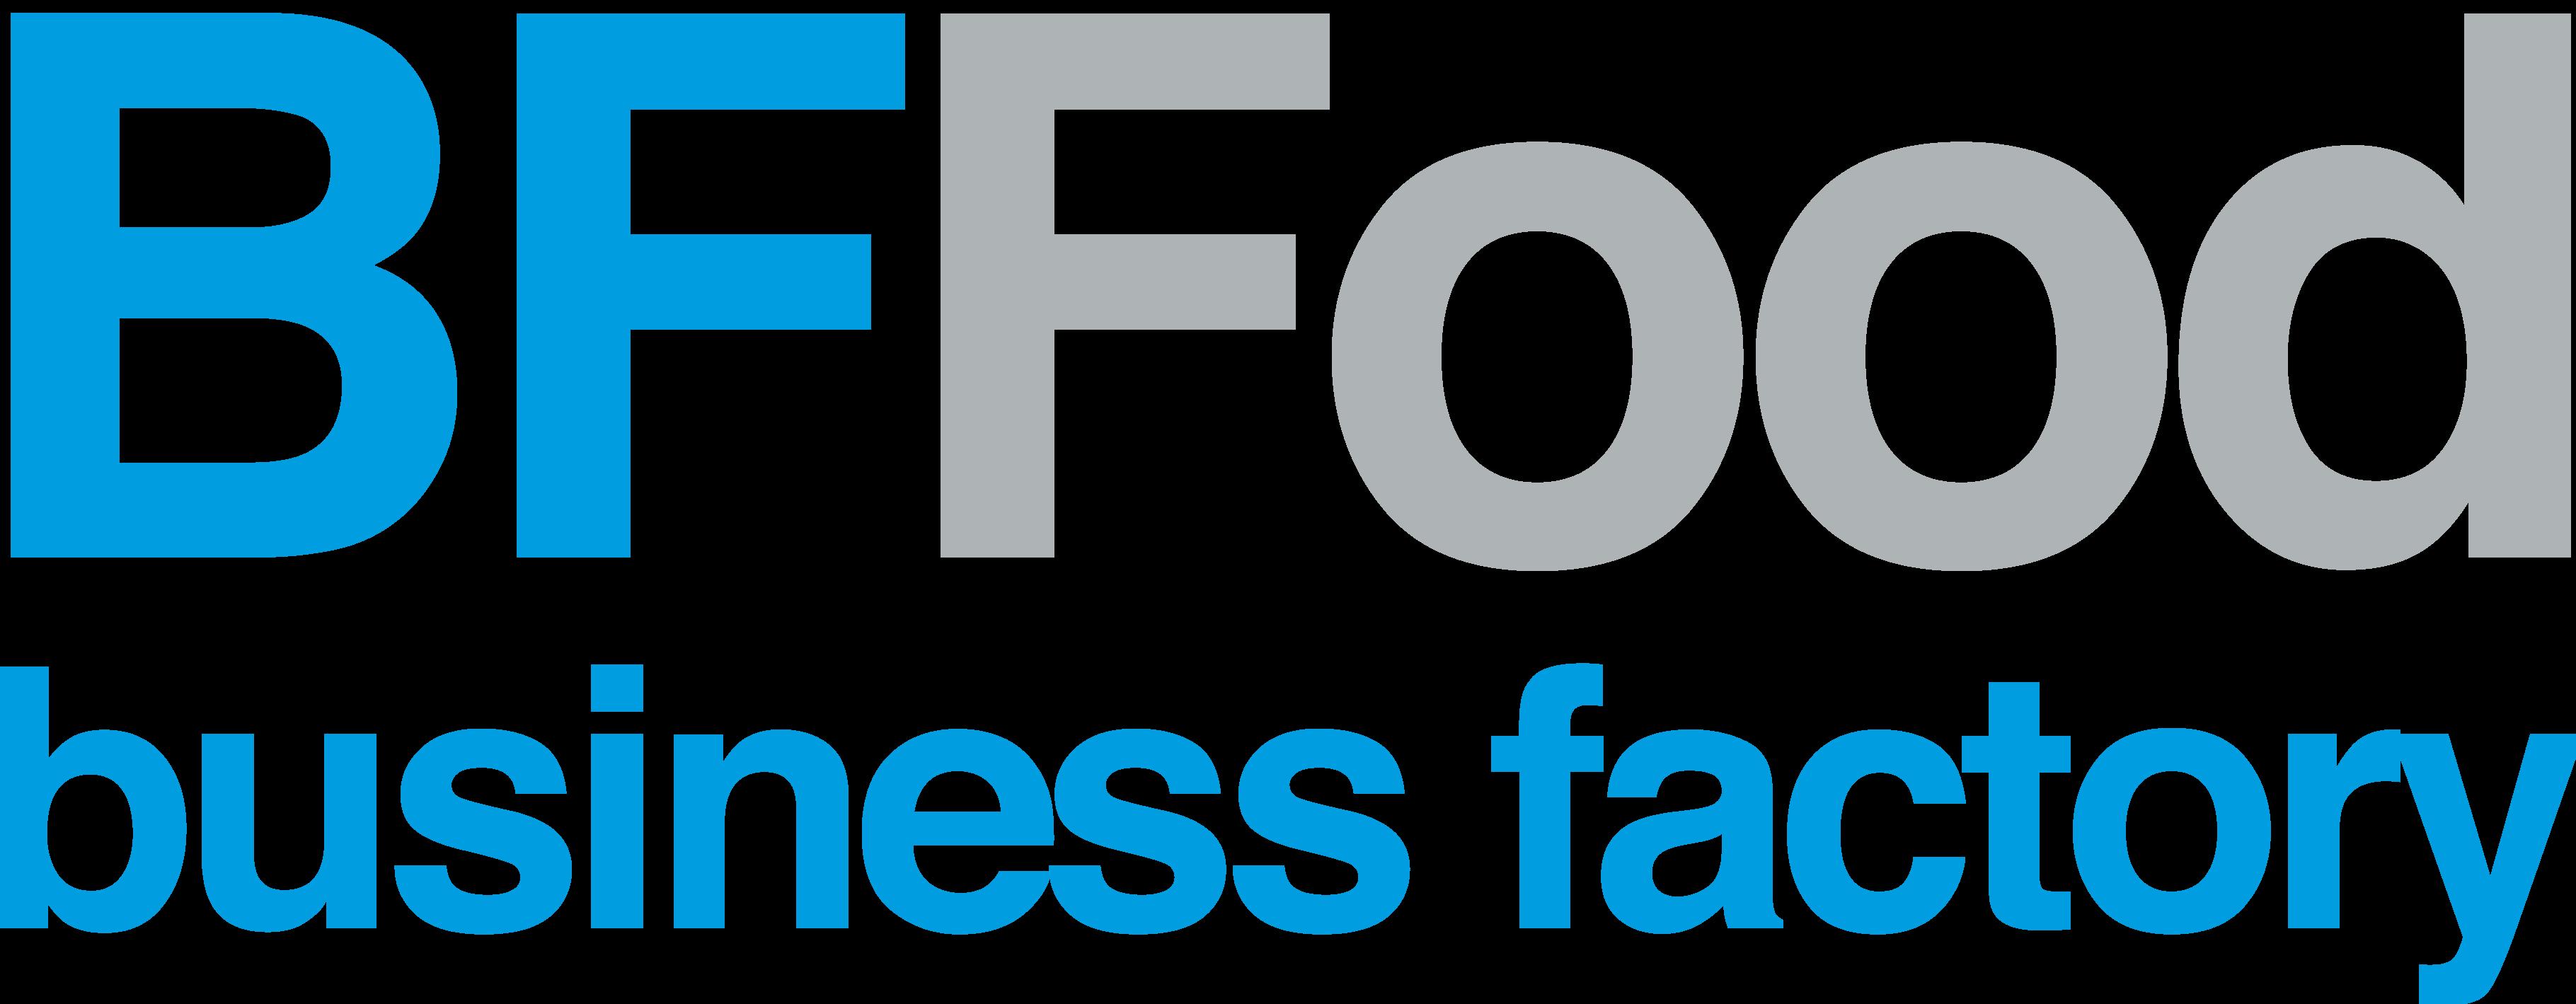 bffood-logo